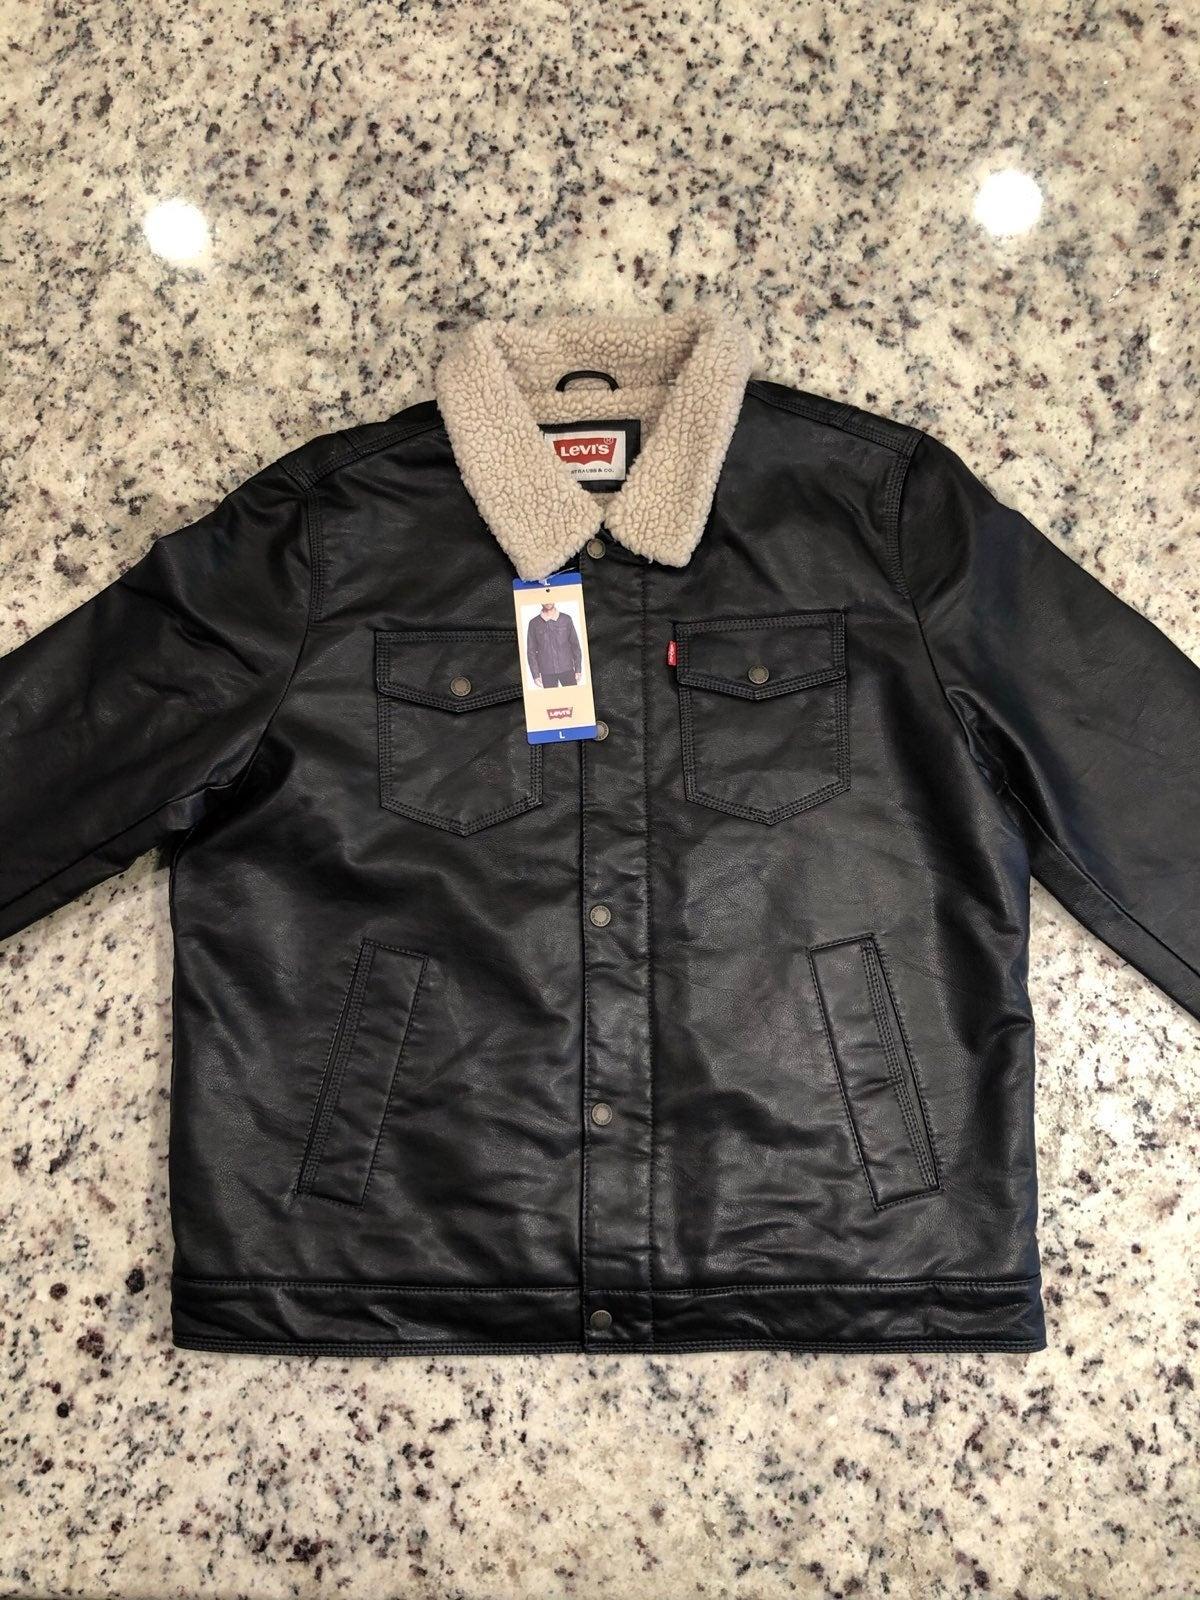 Levi's Men's Faux Leather Sherpa Jacket